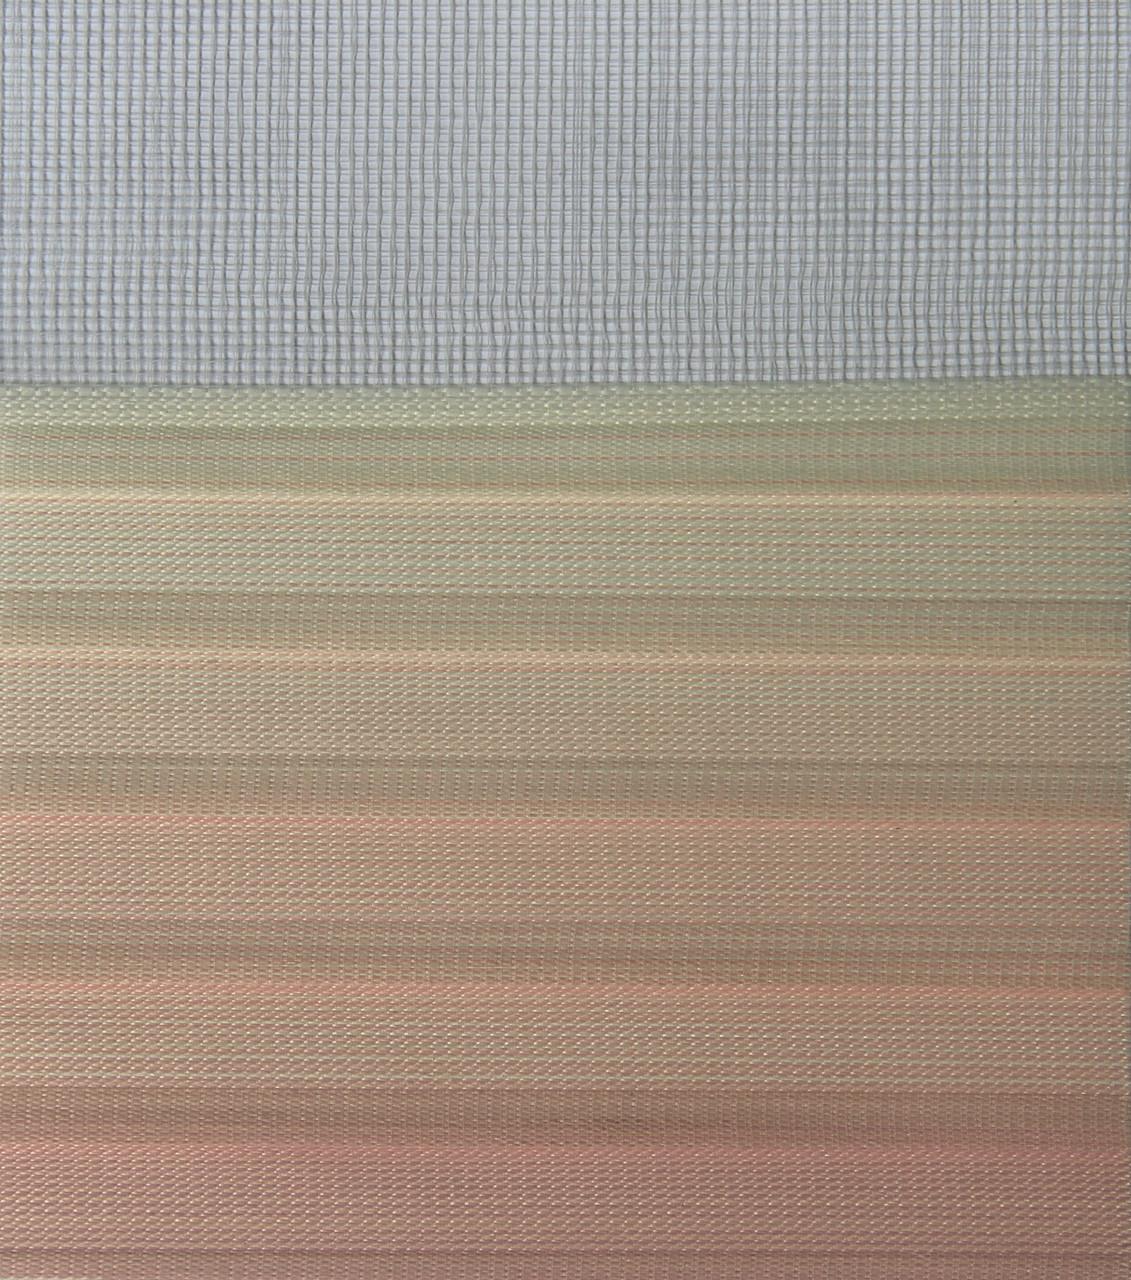 Готовые рулонные шторы Ткань Z-570 Бежево-розовый